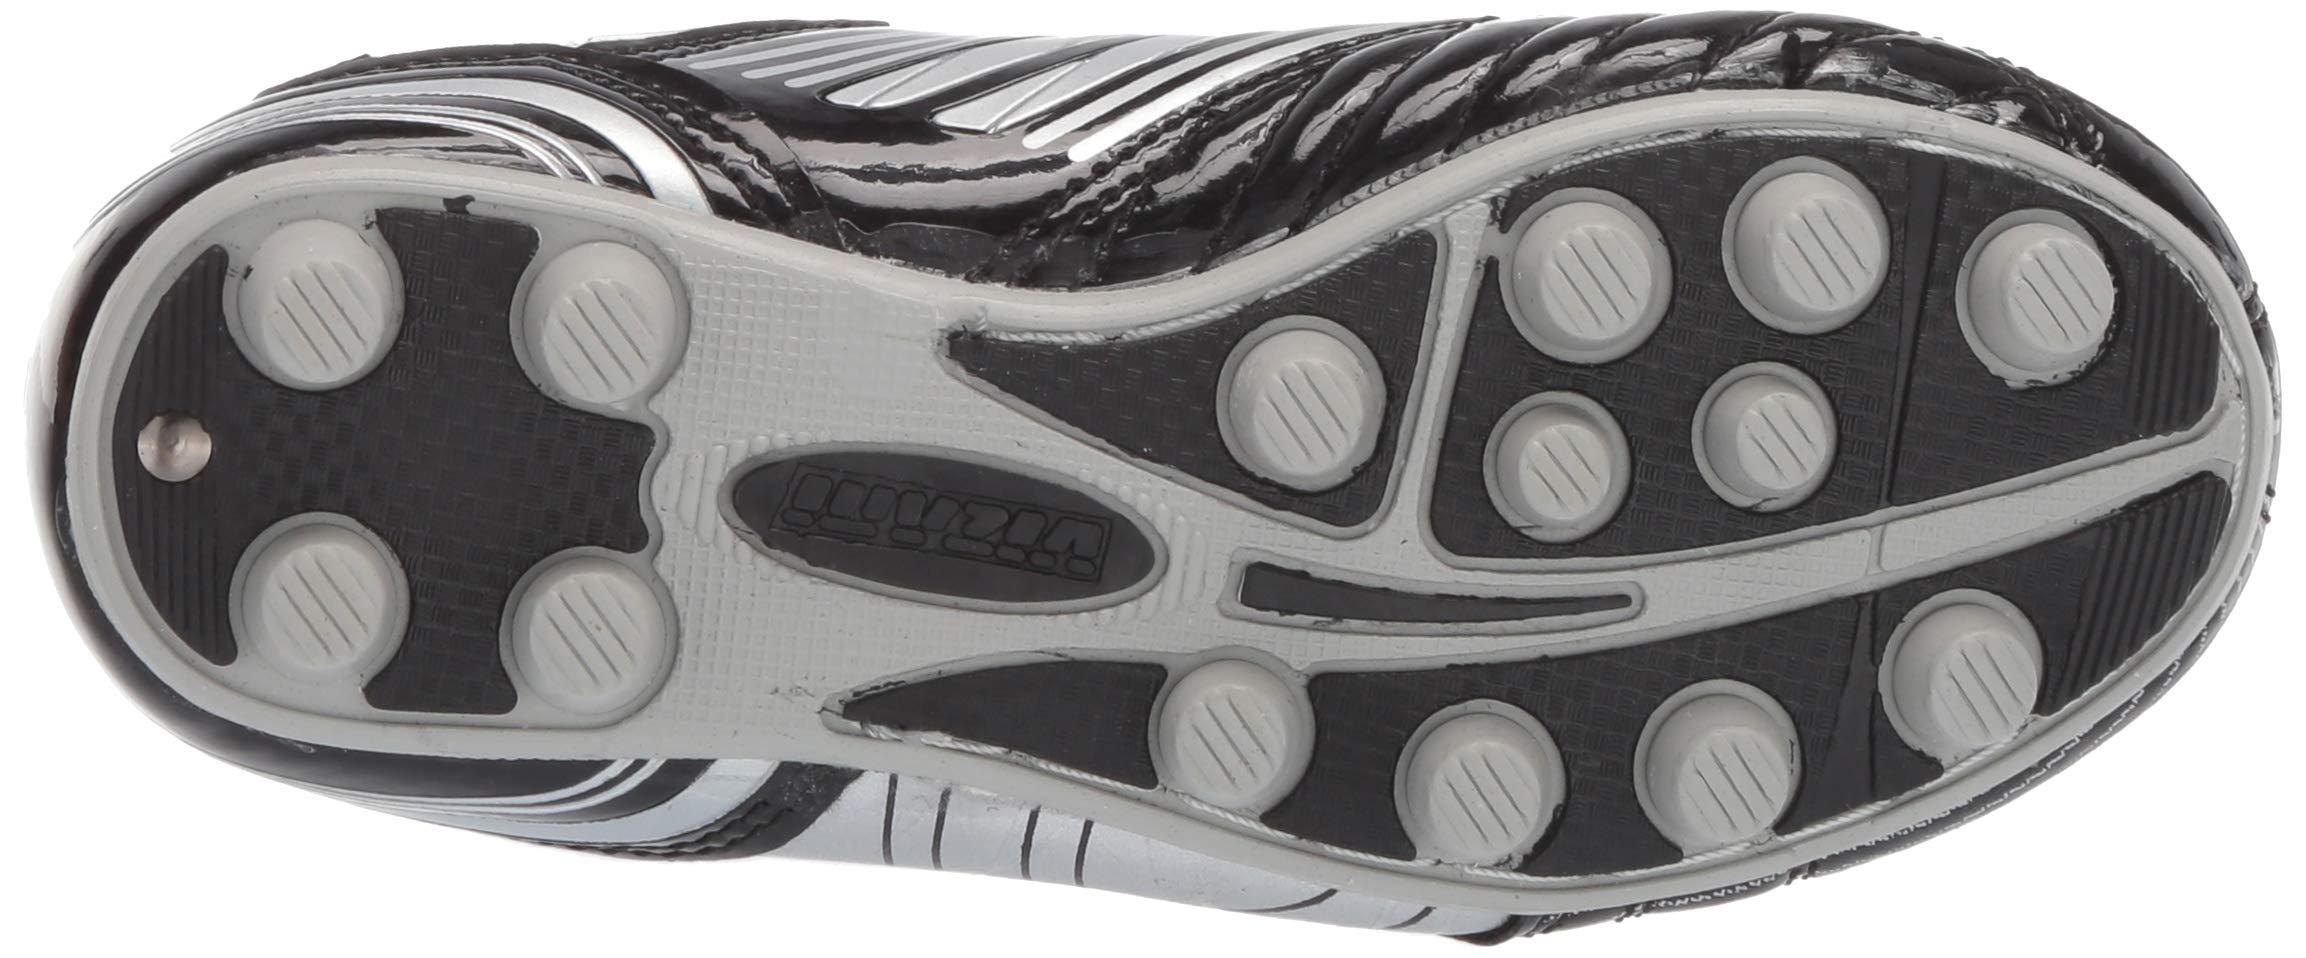 Vizari Striker FG Soccer Shoe (Toddler/Little Kid/Big Kid),Black/Silver,10 M US Toddler by Vizari (Image #3)